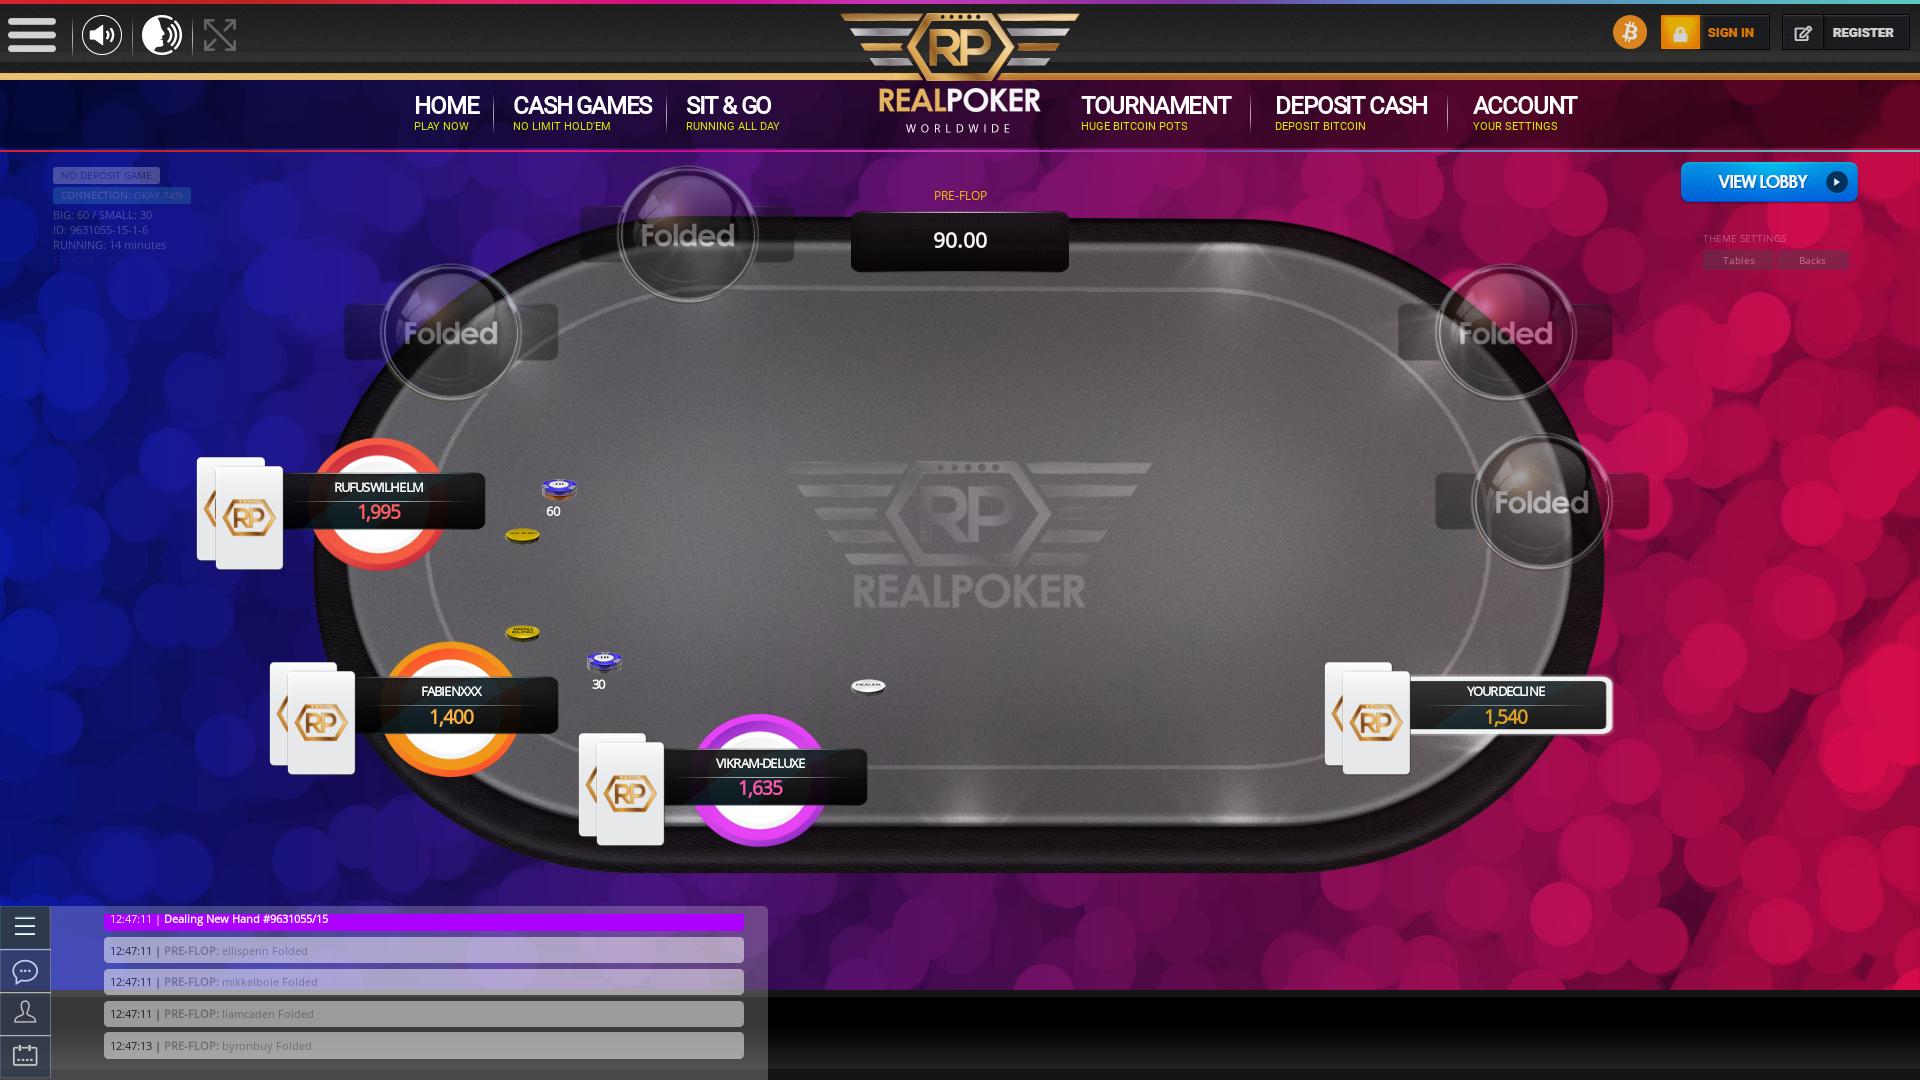 Casino bitcoin deposit - 26026